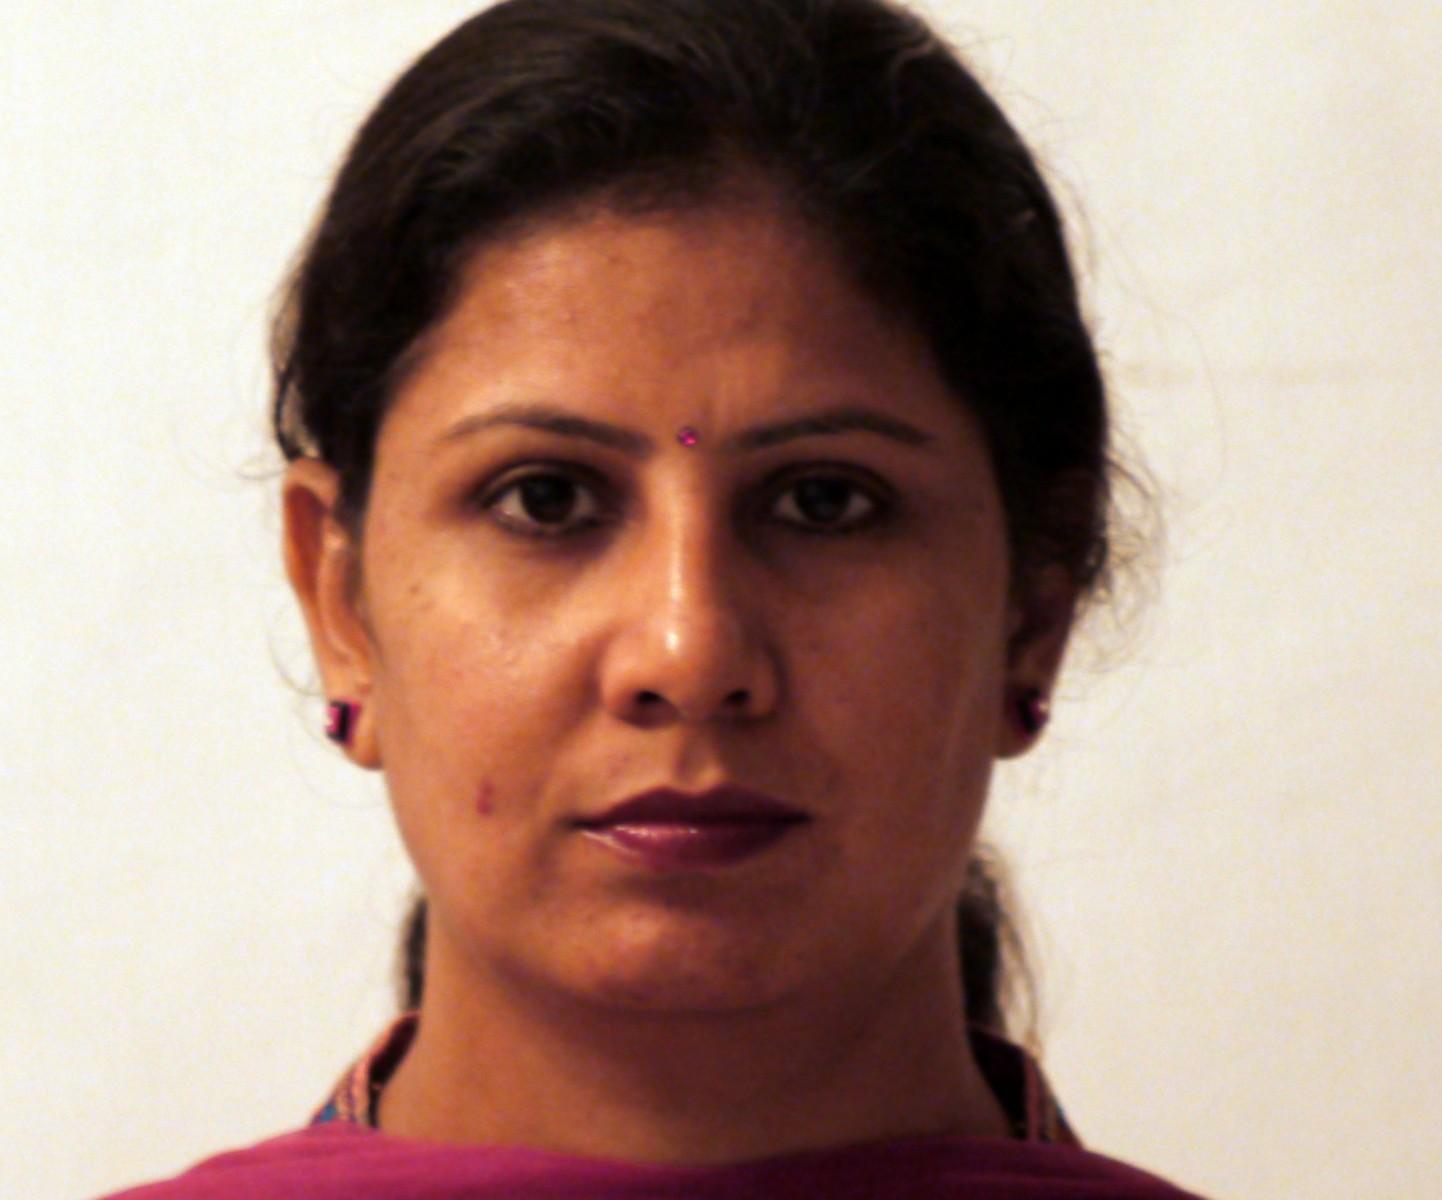 PAS Nantes 2012 - Reena Mahe (Inde) - Productrice - CHENU